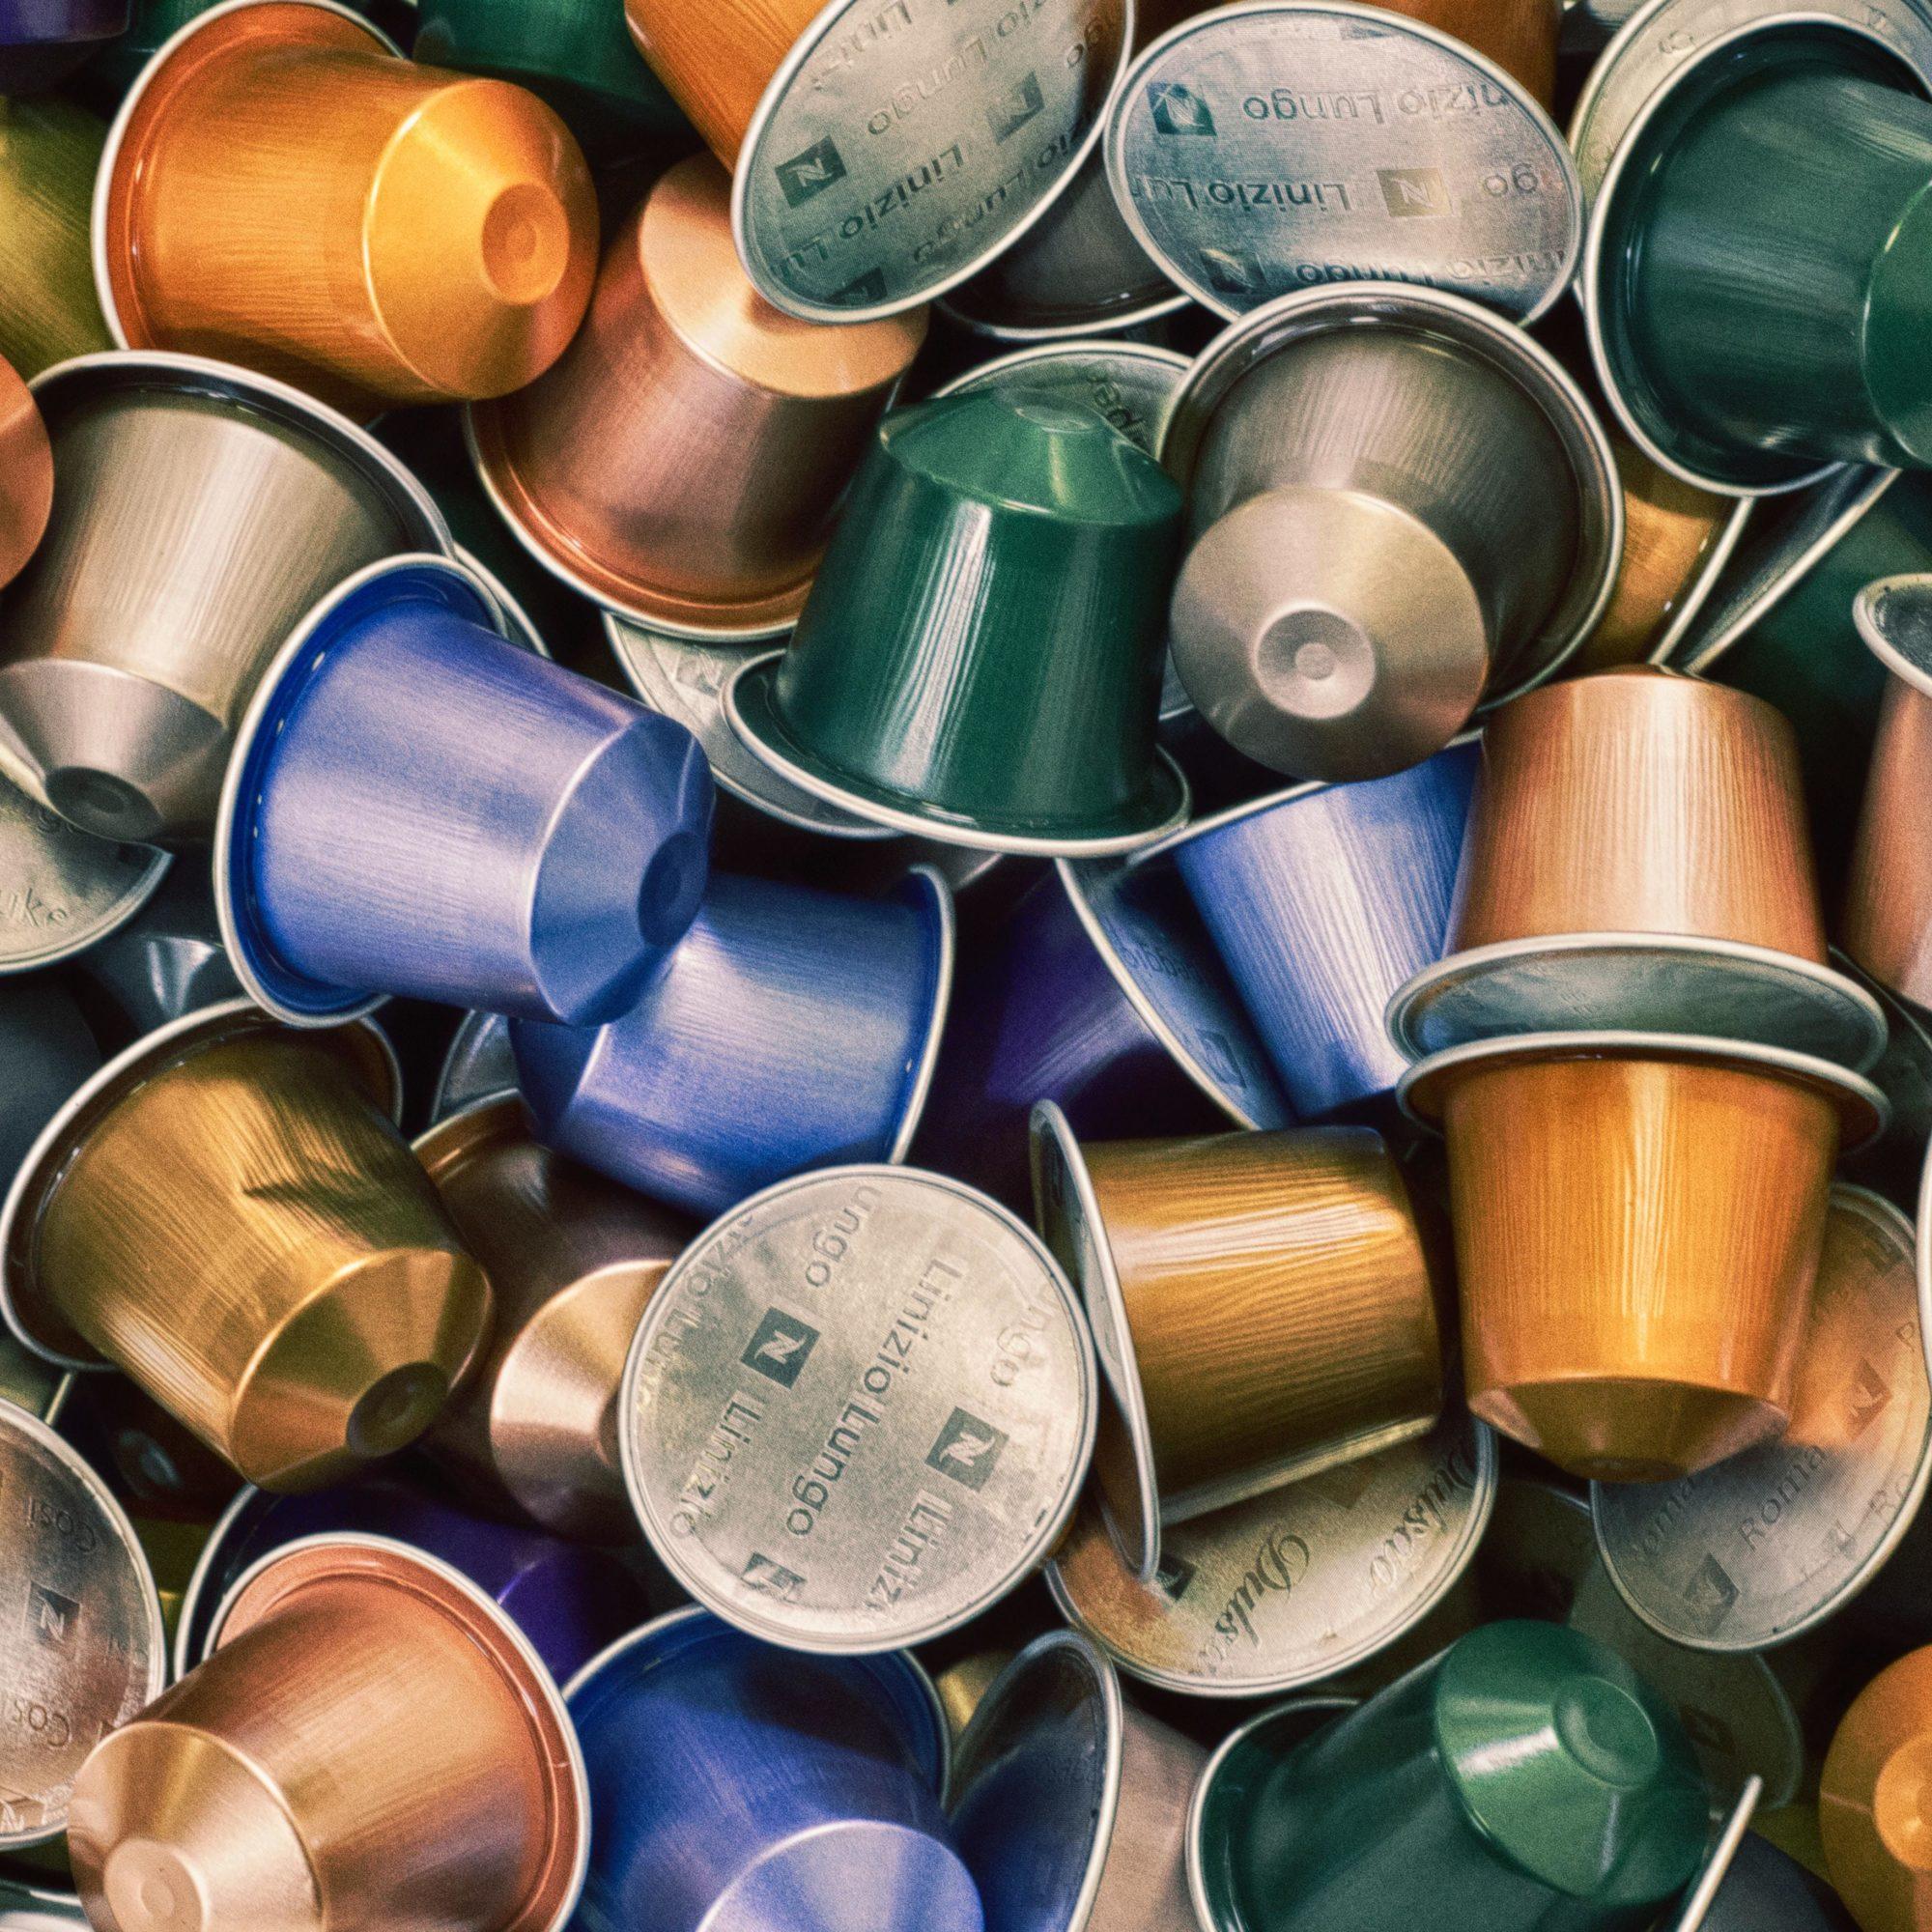 nespresso capsules used for caran d'ache pen